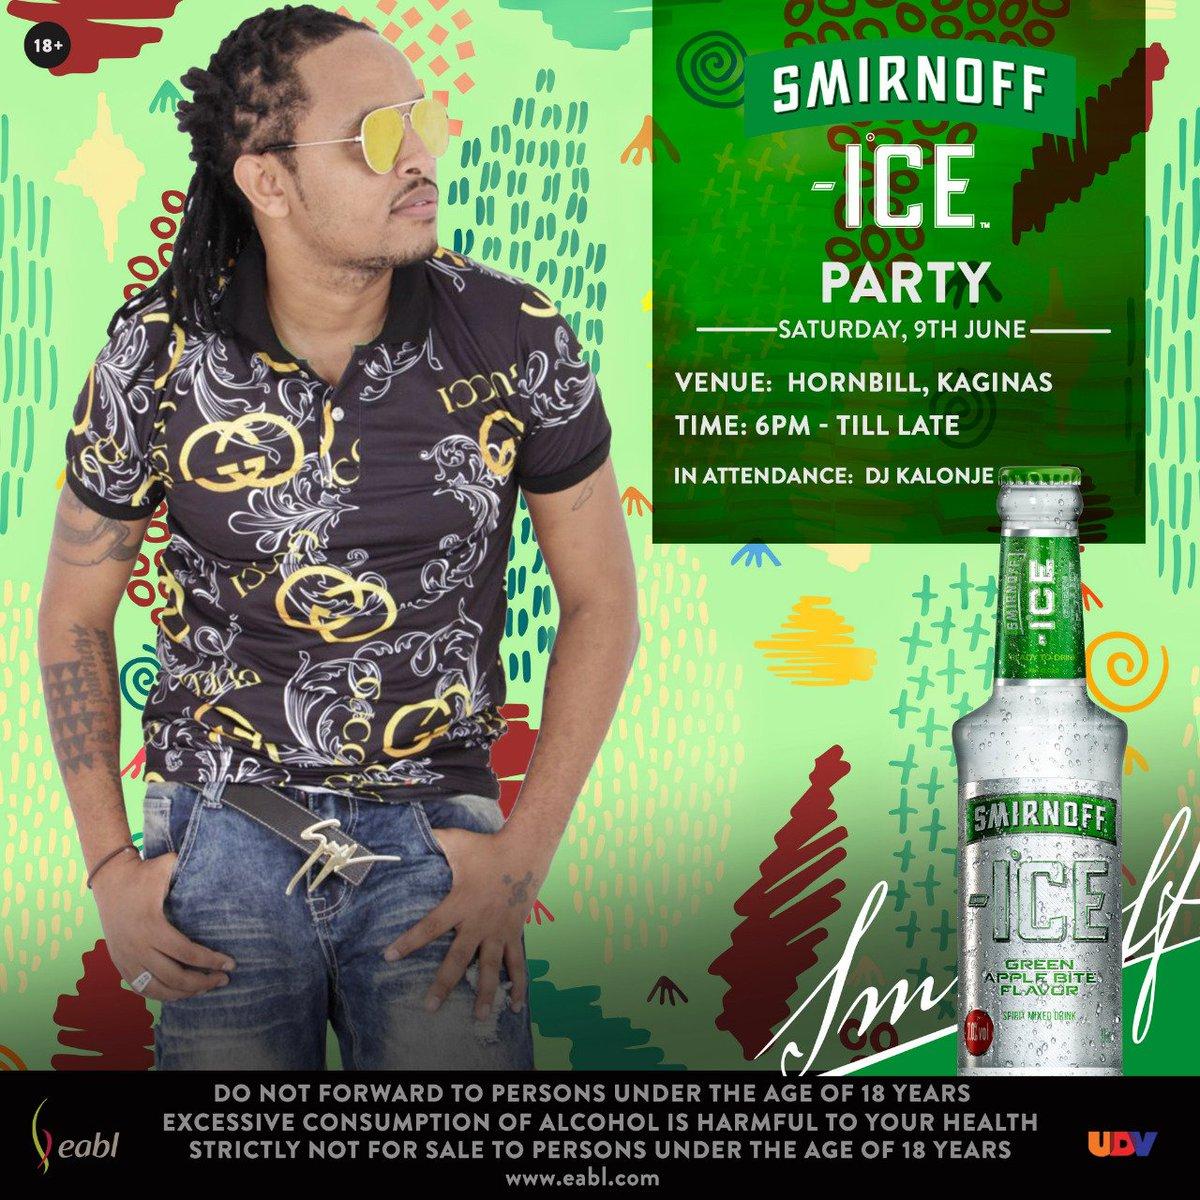 Smirnoff Kenya on Twitter: